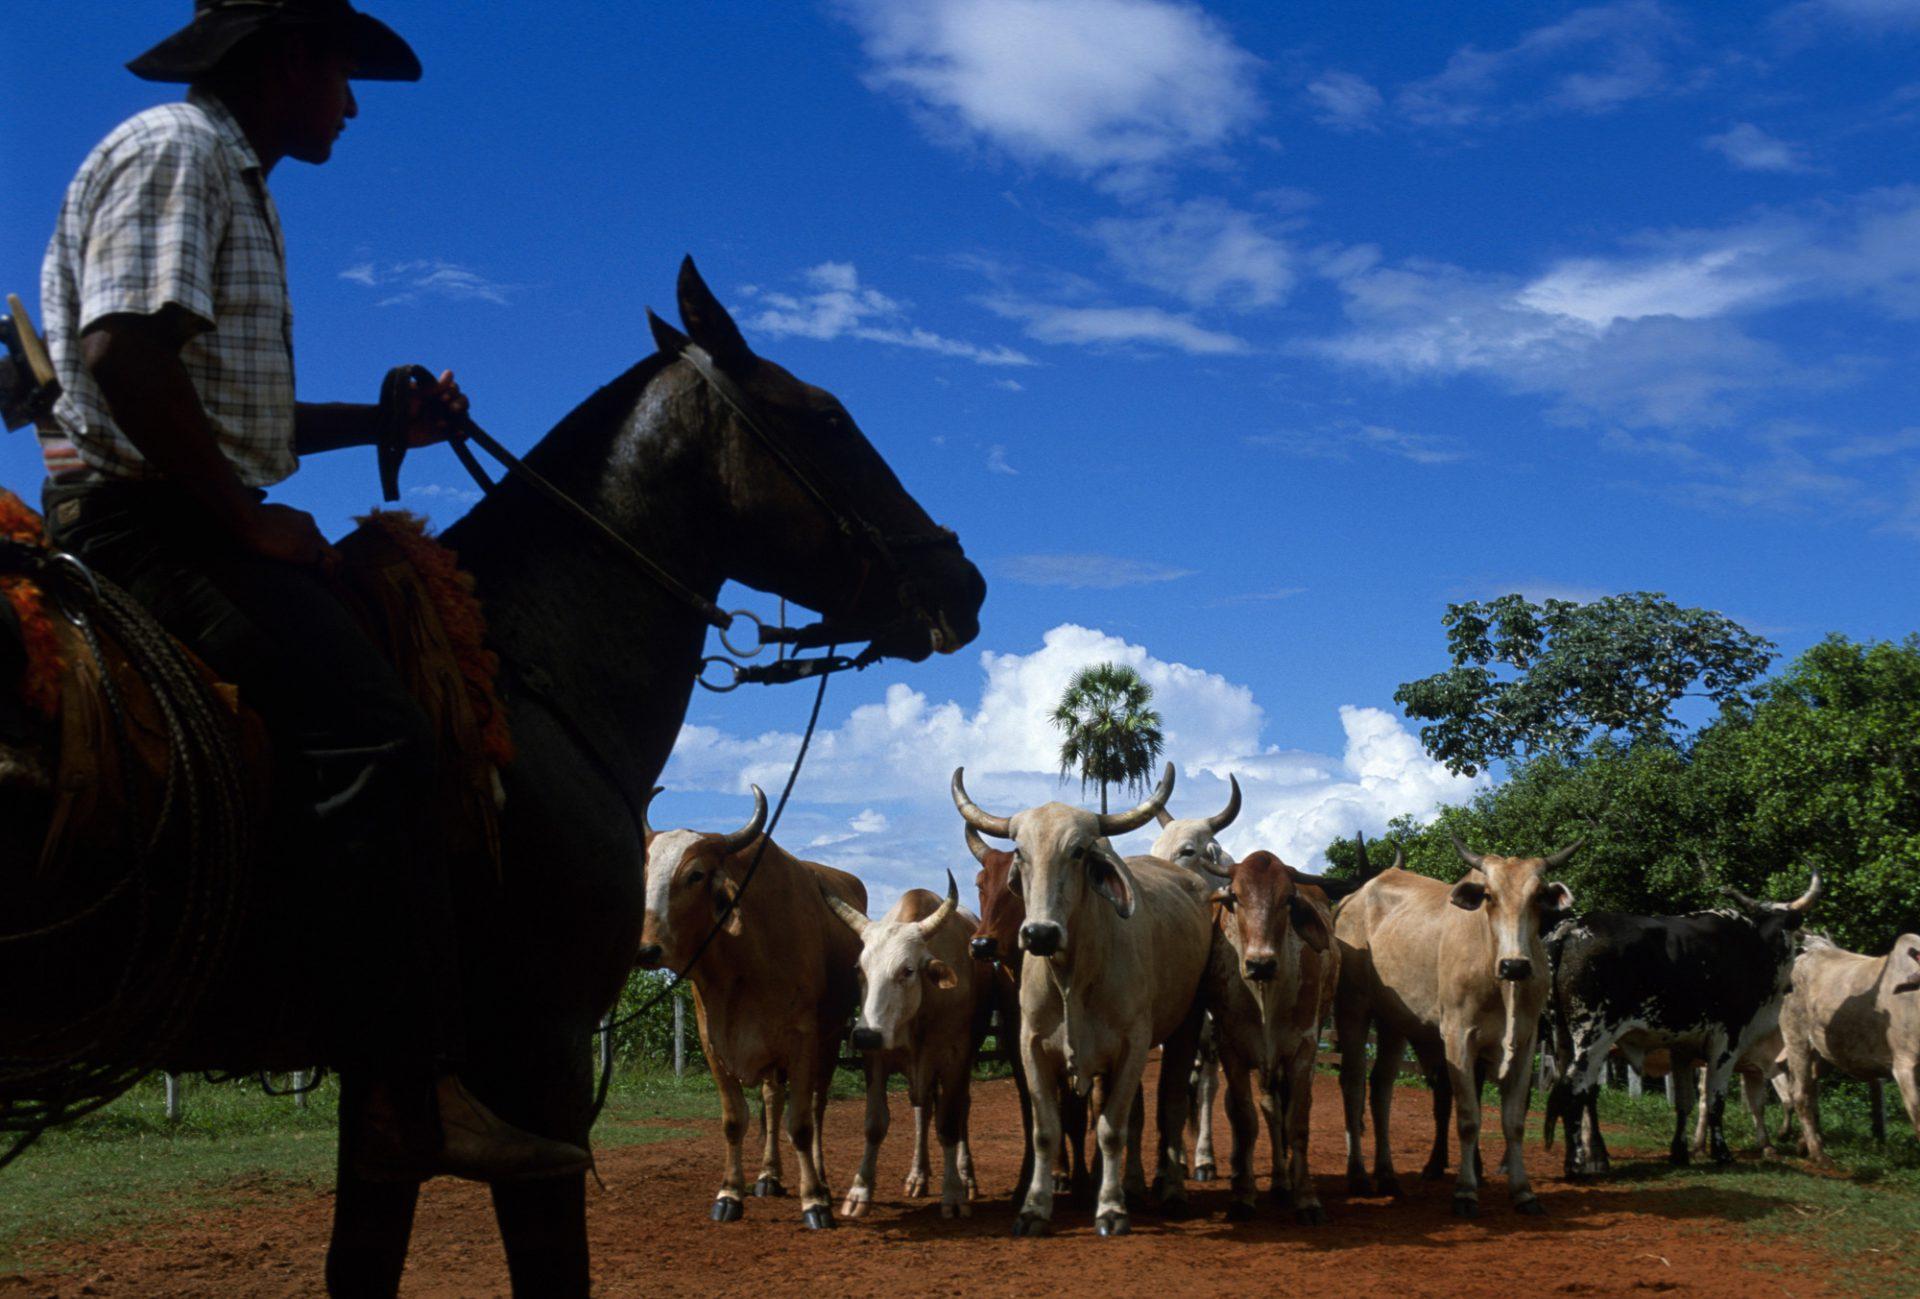 Photo: A pantaniero (cowboy) herds cattle on horseback at Caiman Ranch in Brazil's Pantanal region.